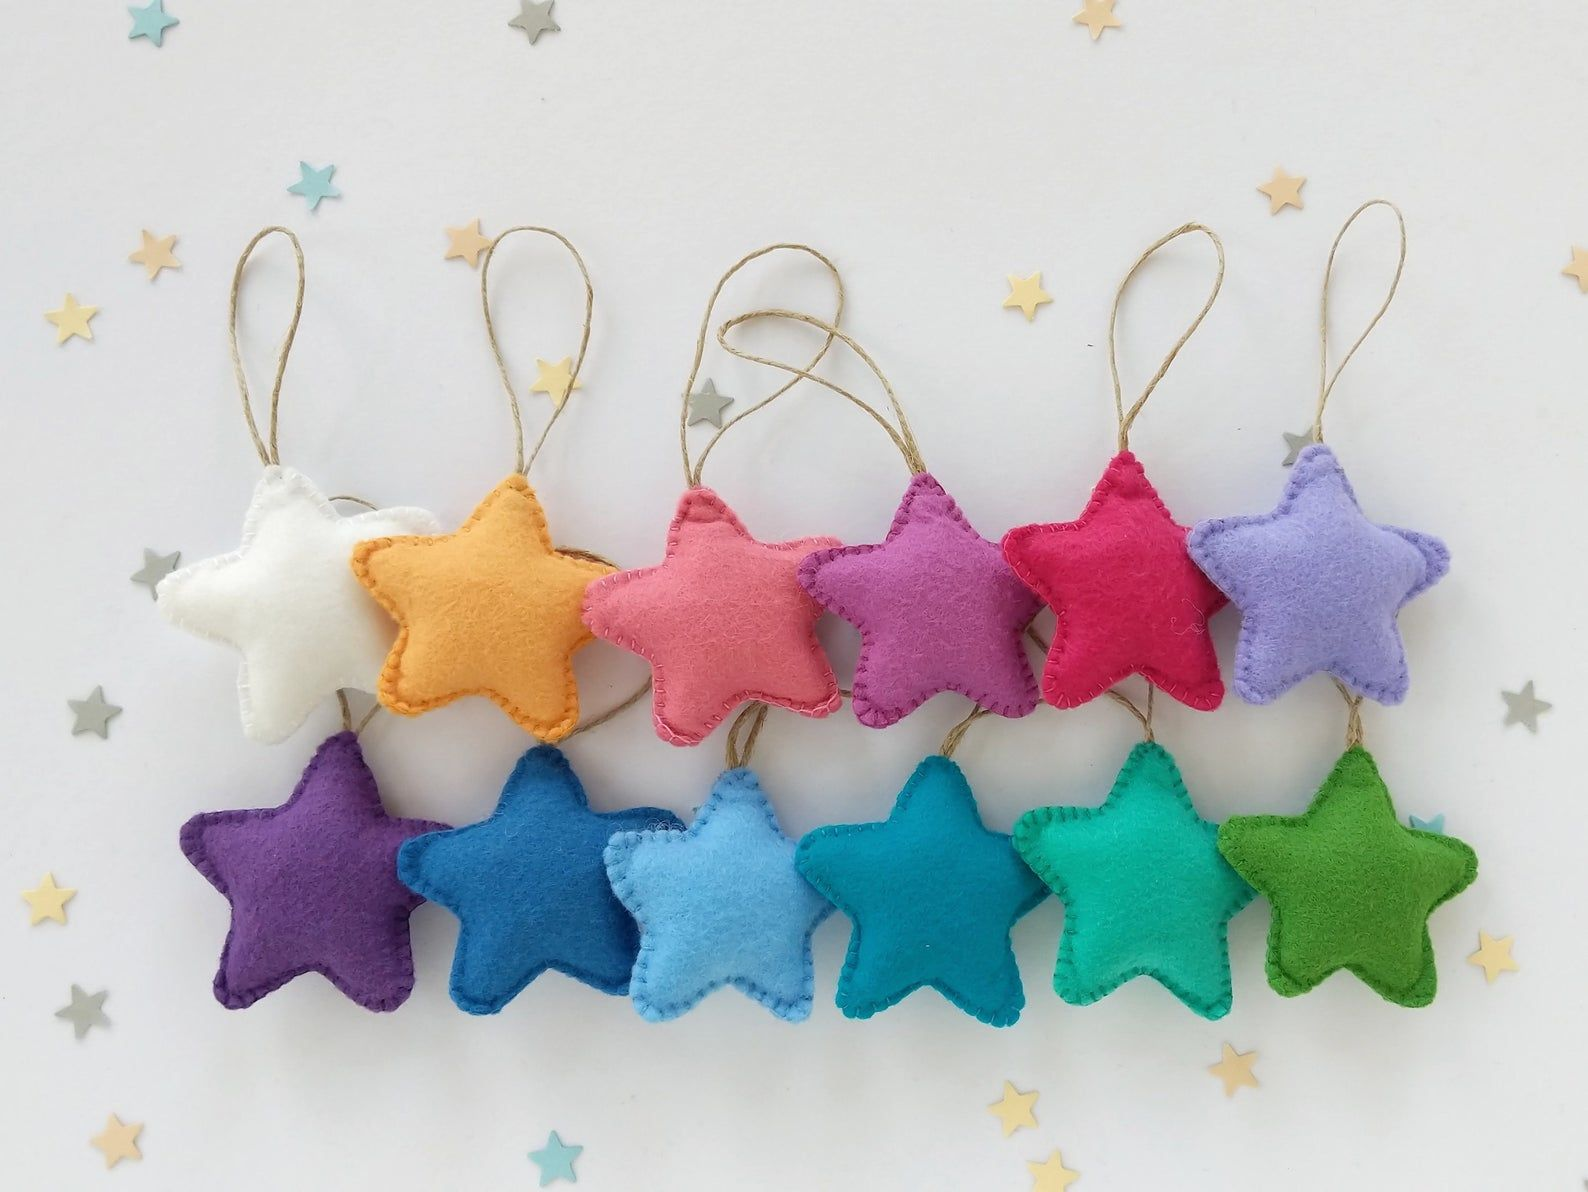 Felt Star Ornaments Christmas Tree Ornaments Set Of 12 Holiday Decoration Rainbow Star Ornament Felt Ornaments Patterns Rainbow Christmas Tree